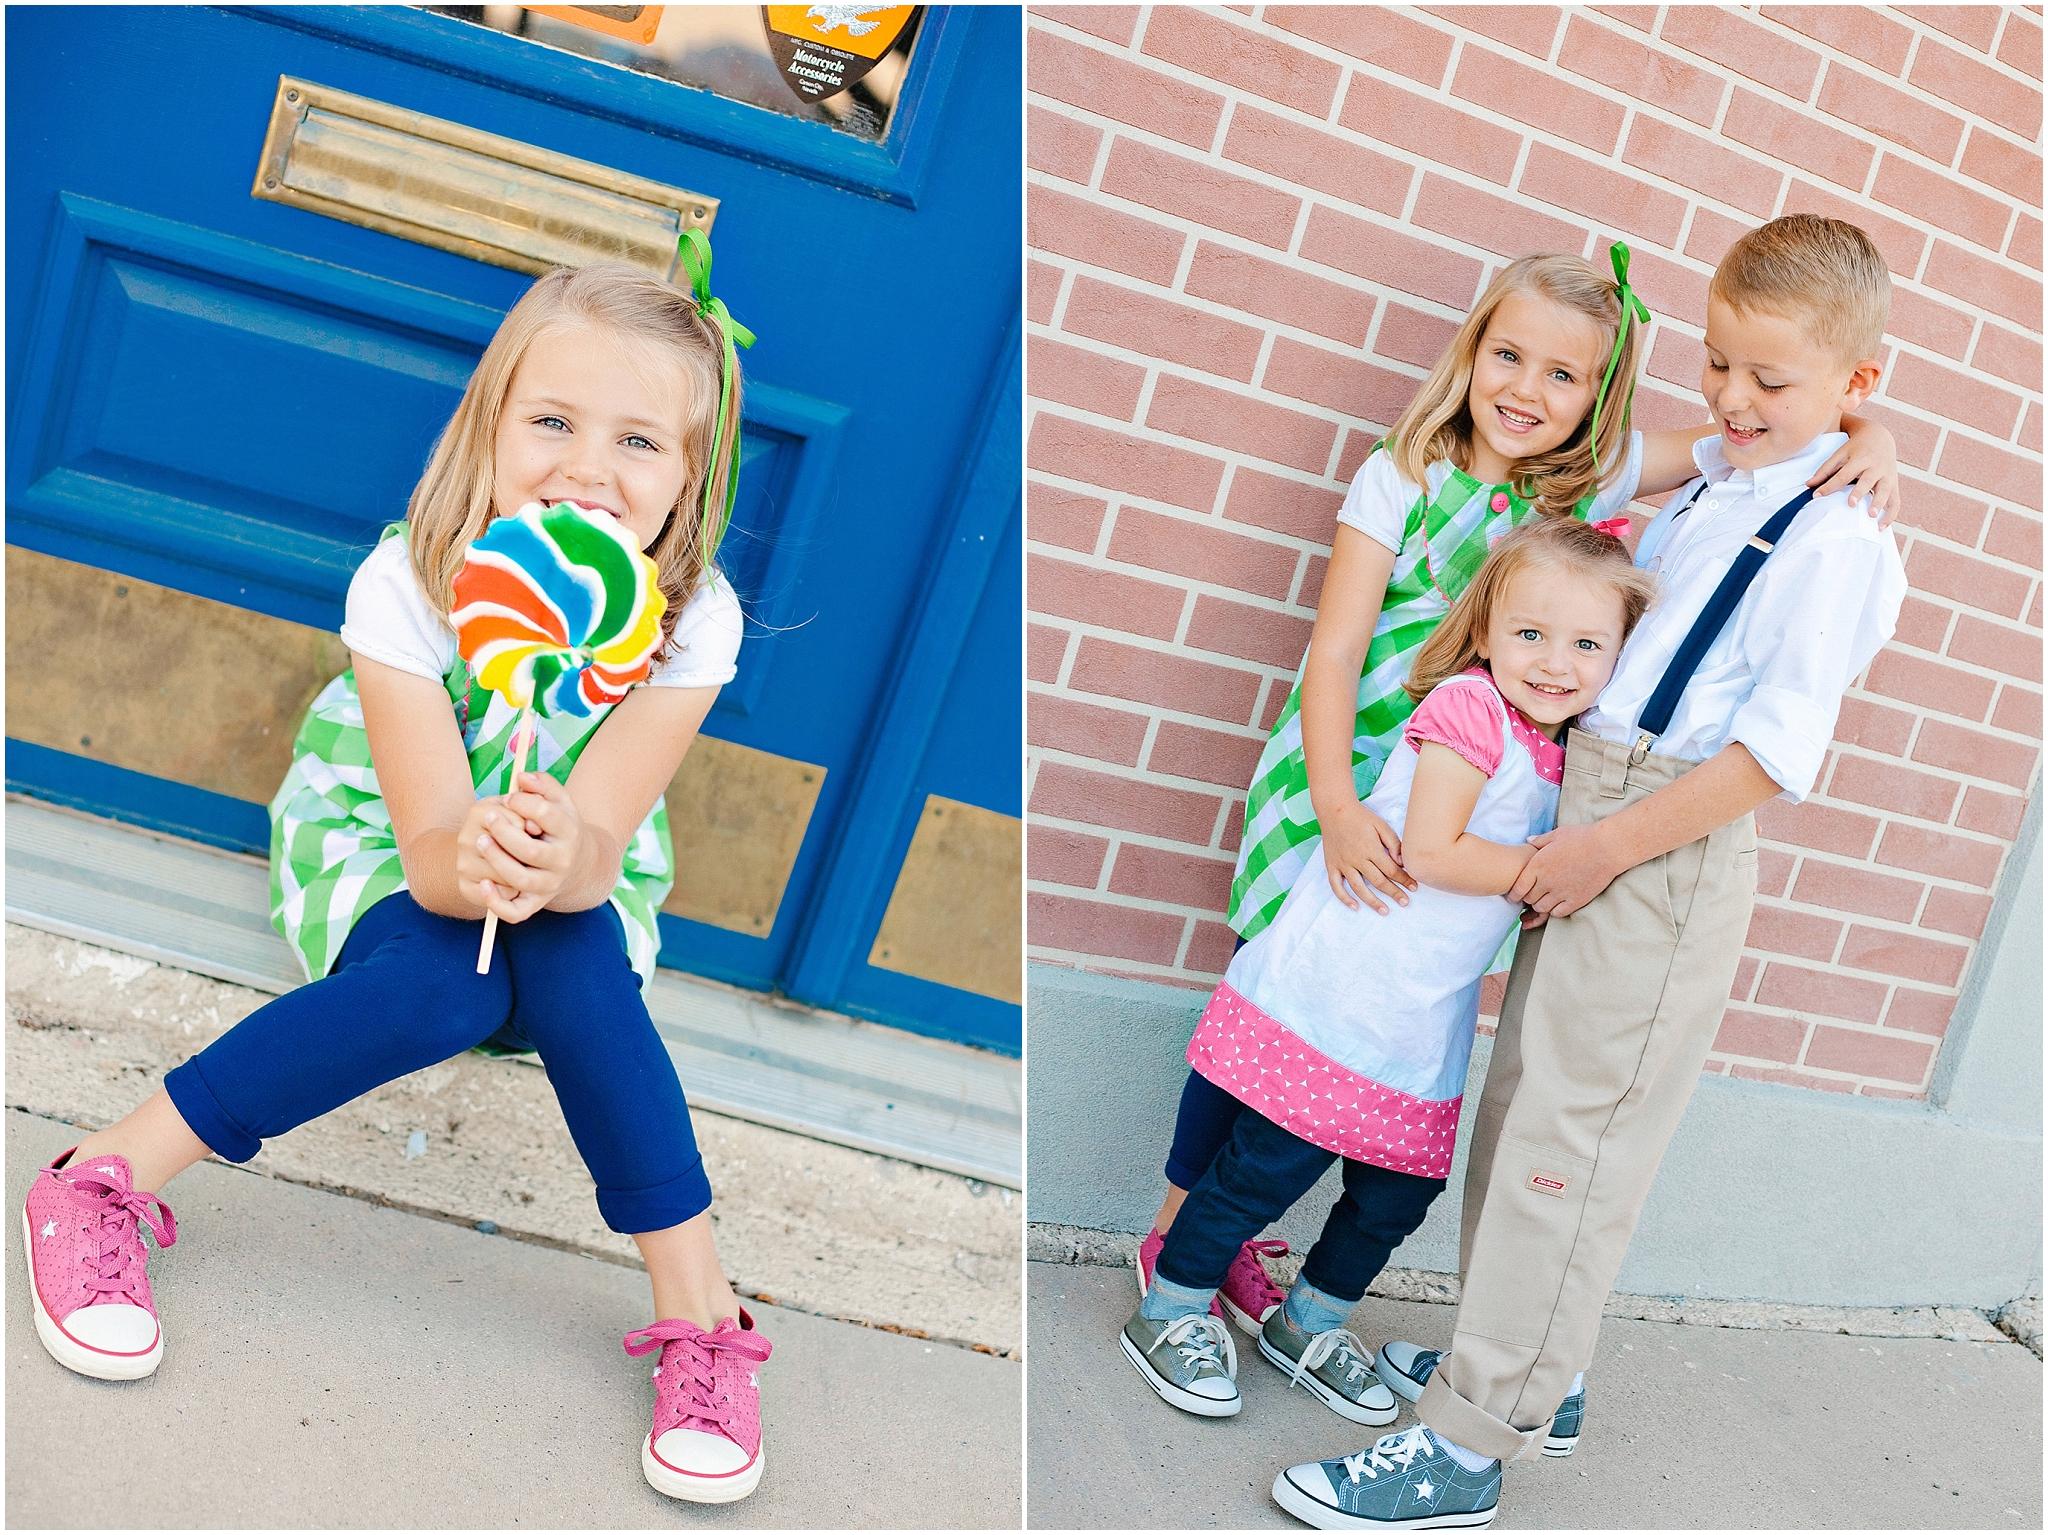 Hanks-19-Edit-14_Lizzie-B-Imagery-Utah-Family-Photographer-Salt-Lake-City-Utah-County-Park-City.jpg